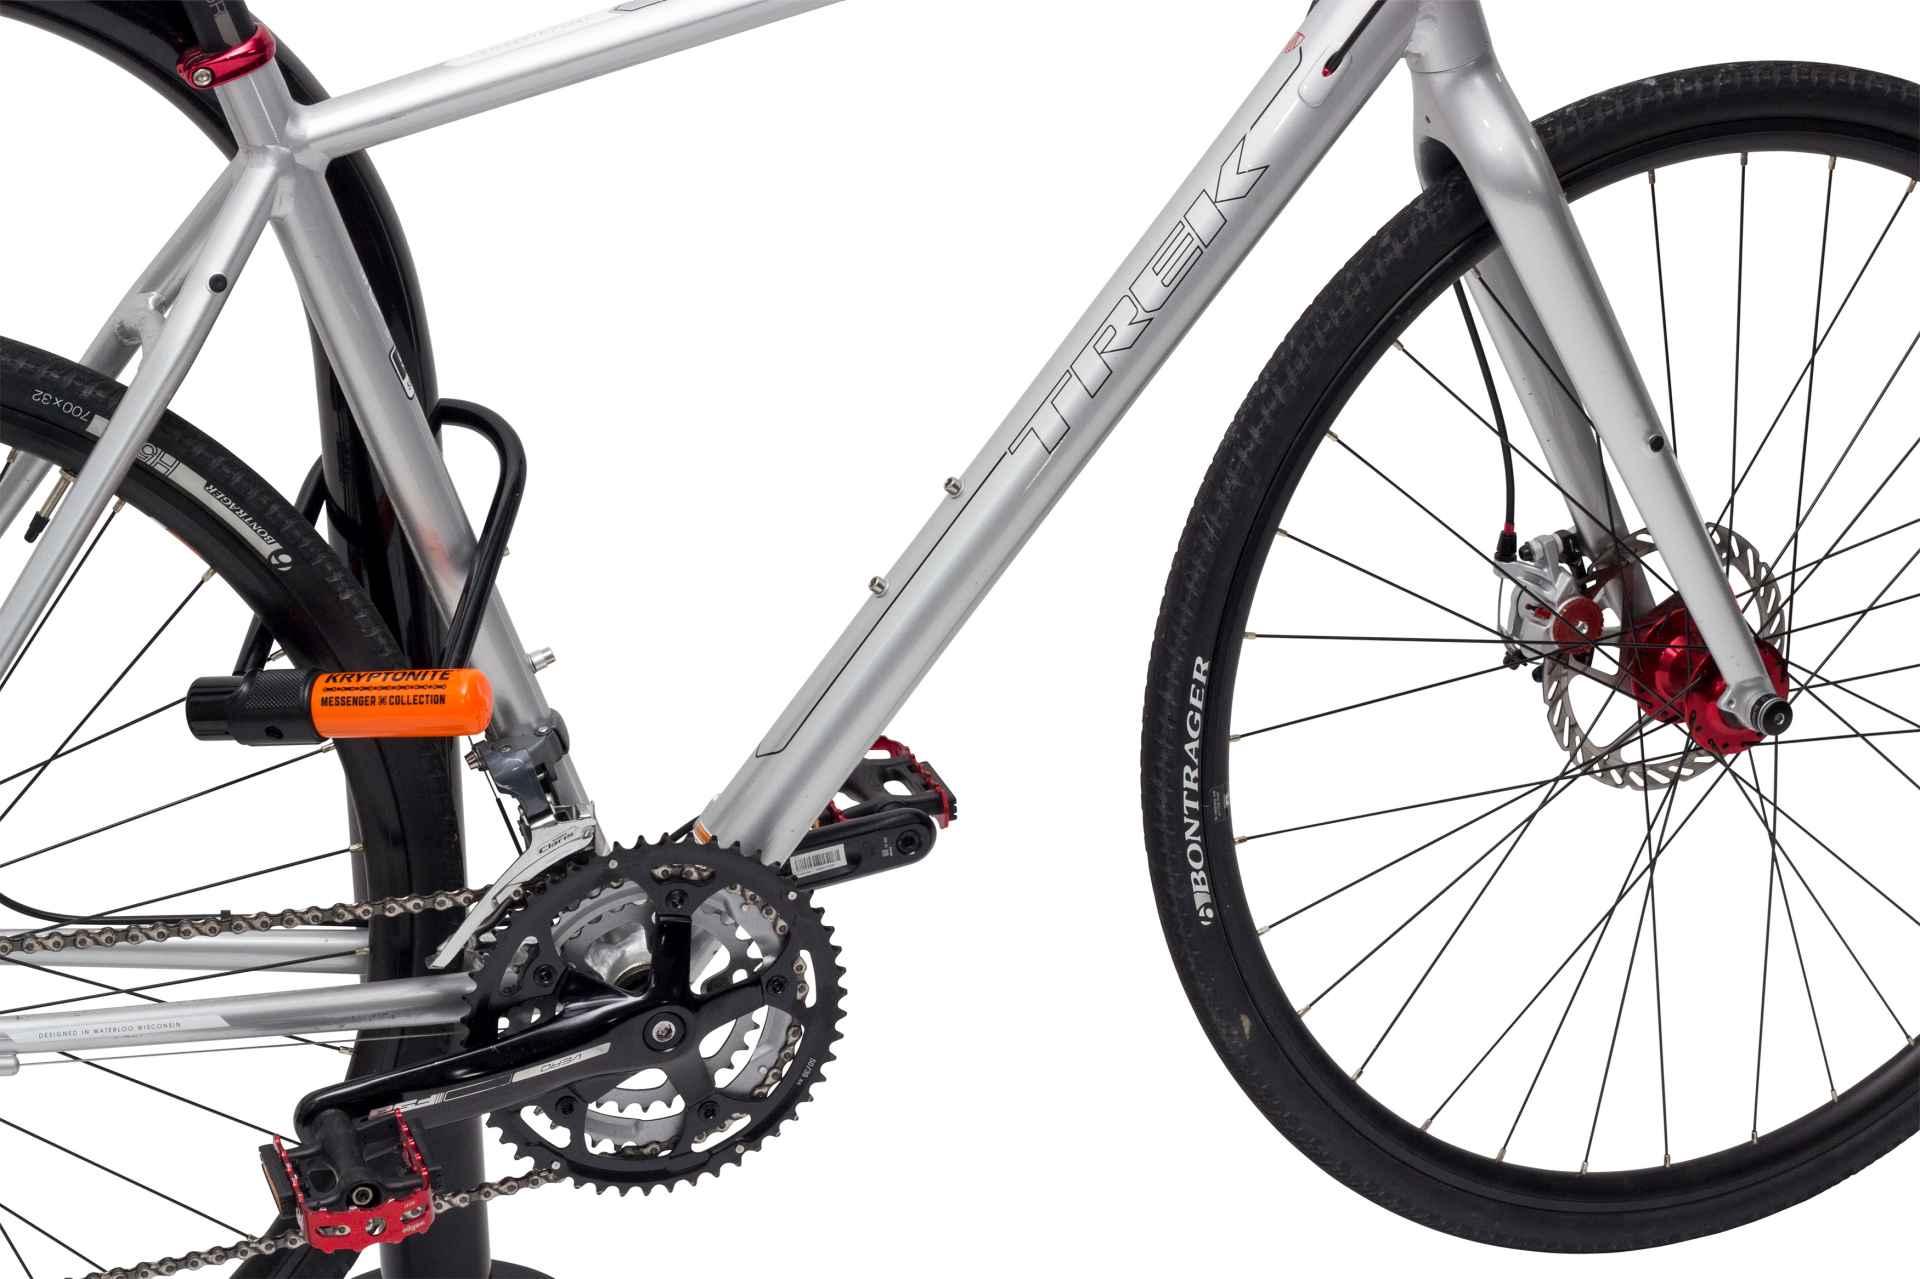 bicycle lock up ebike. Black Bedroom Furniture Sets. Home Design Ideas